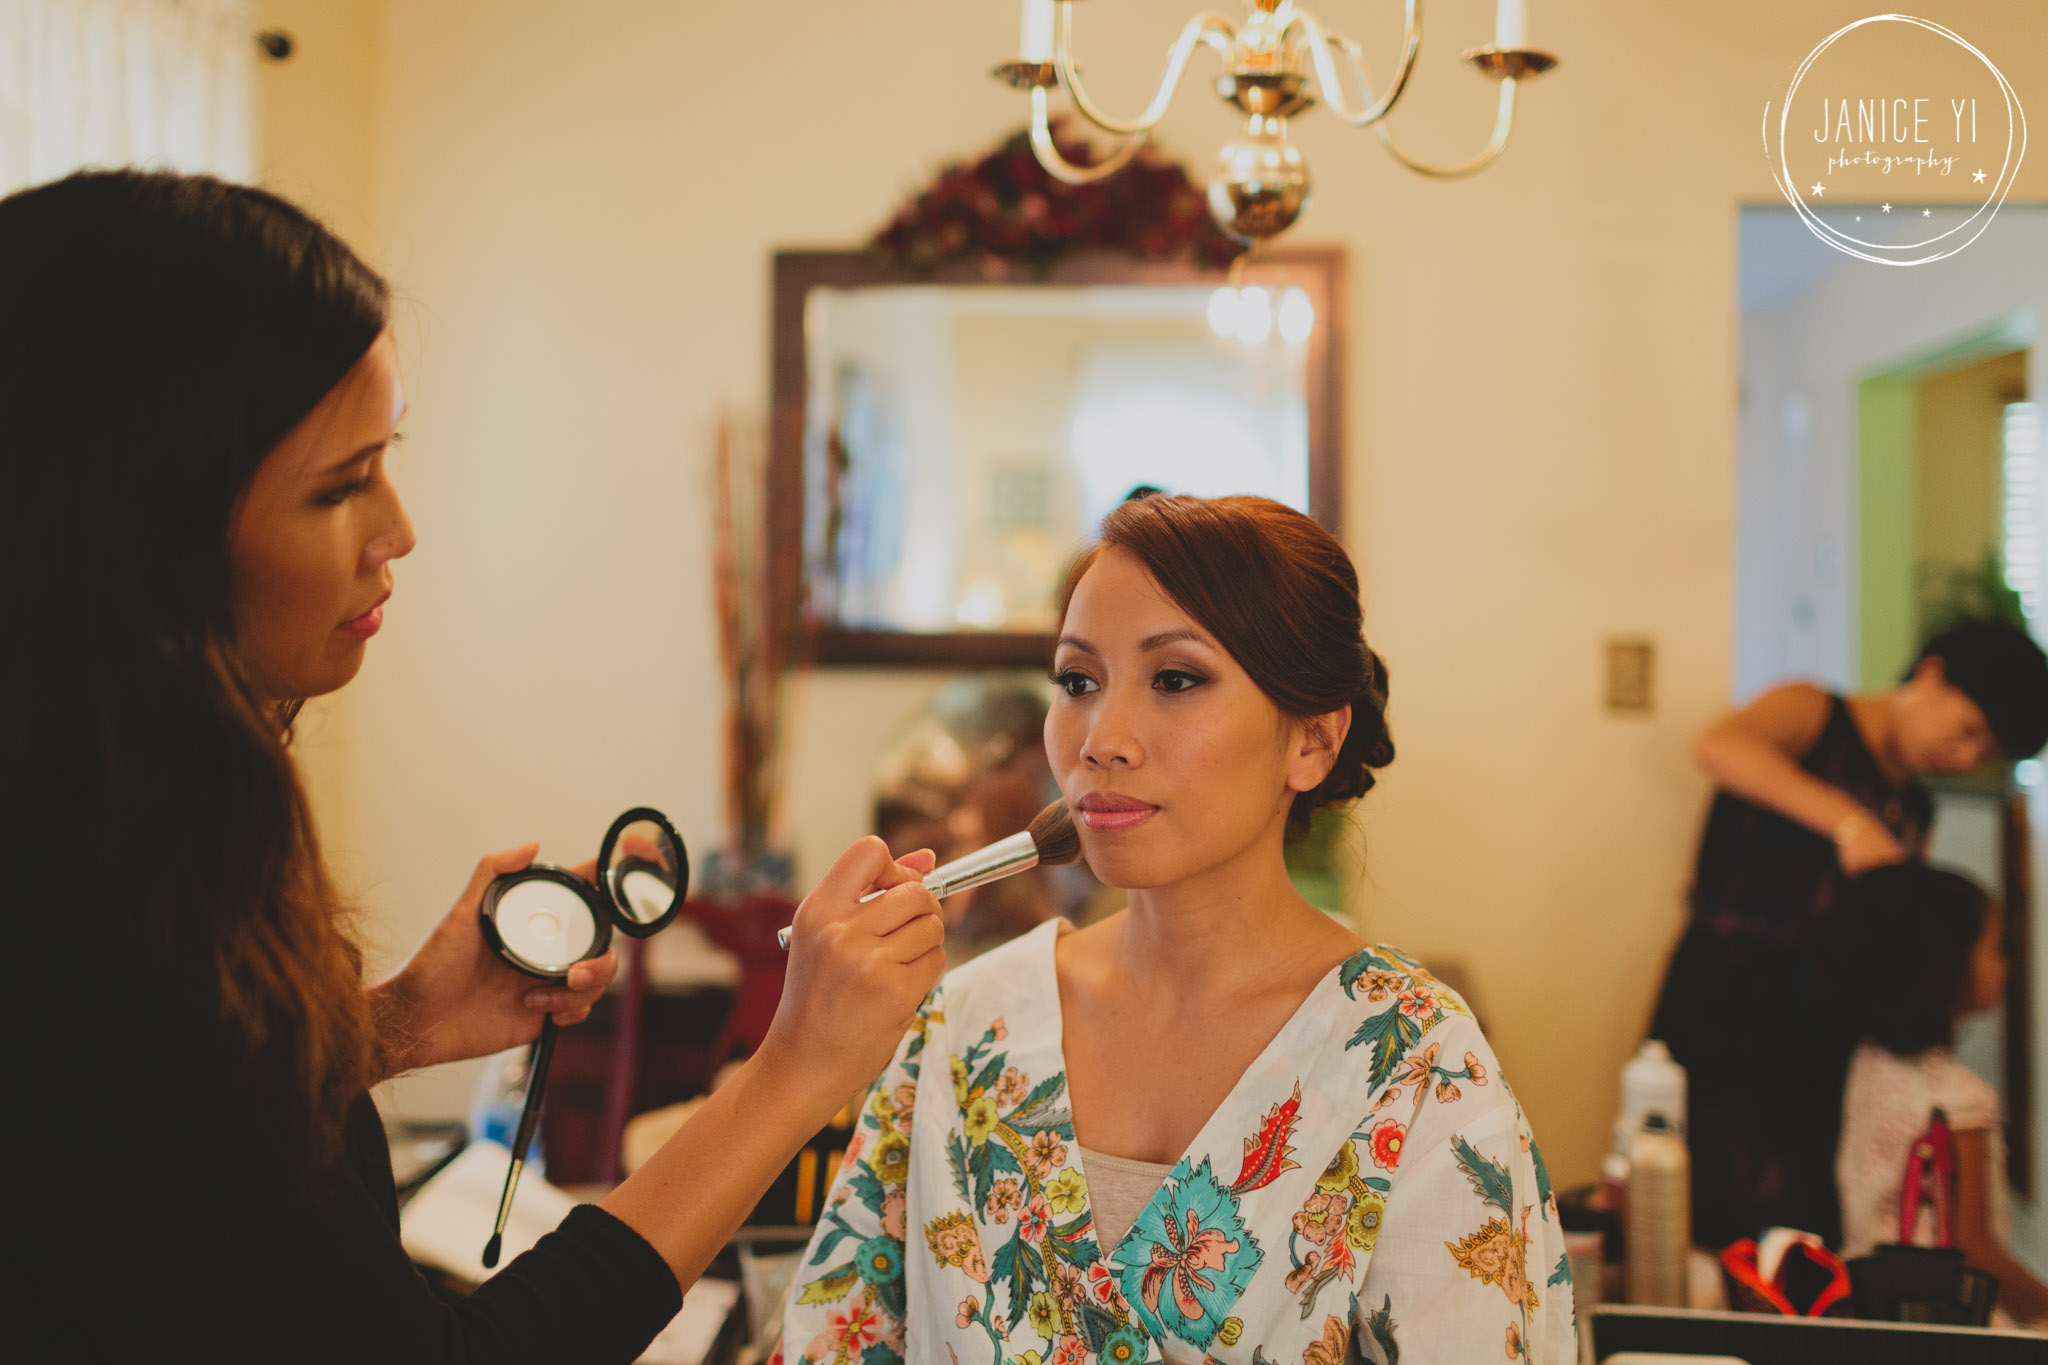 toronto make-up artist hairstylist wedding rhia amio artistrhi 03